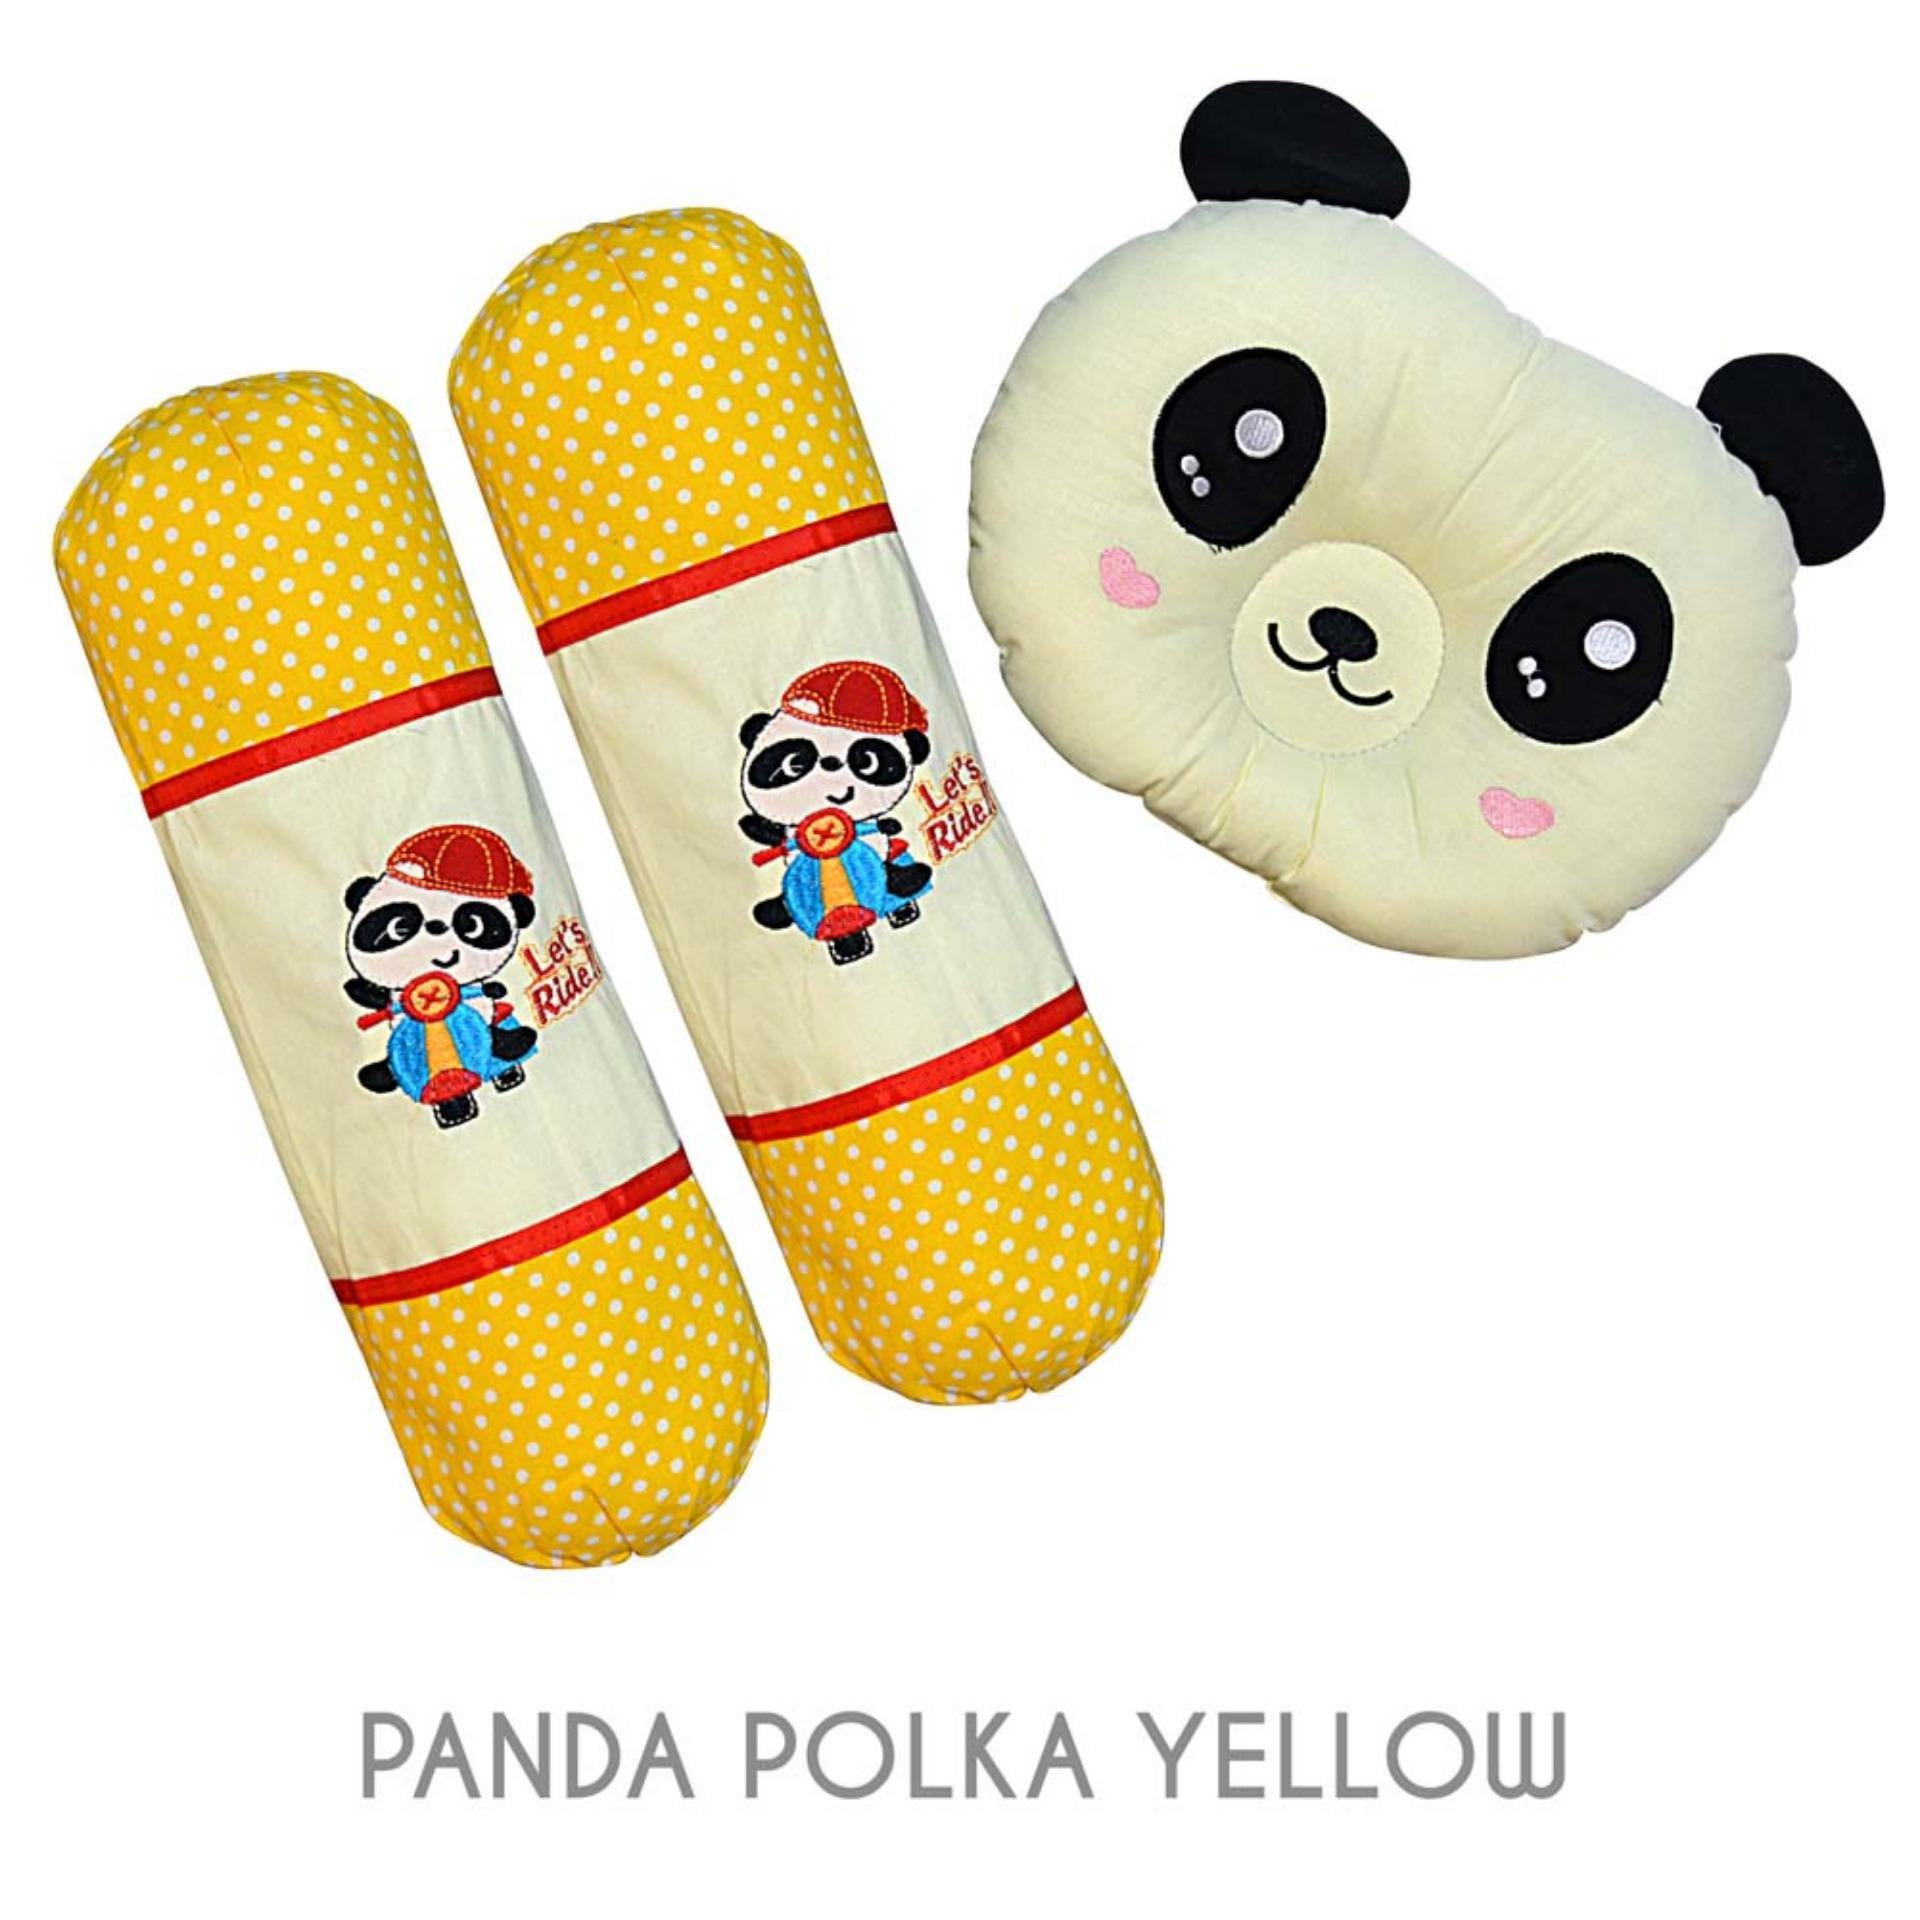 Jual Darby Set Bantal Guling Bordir Bayi Motif Panda Polka Yellow Ori